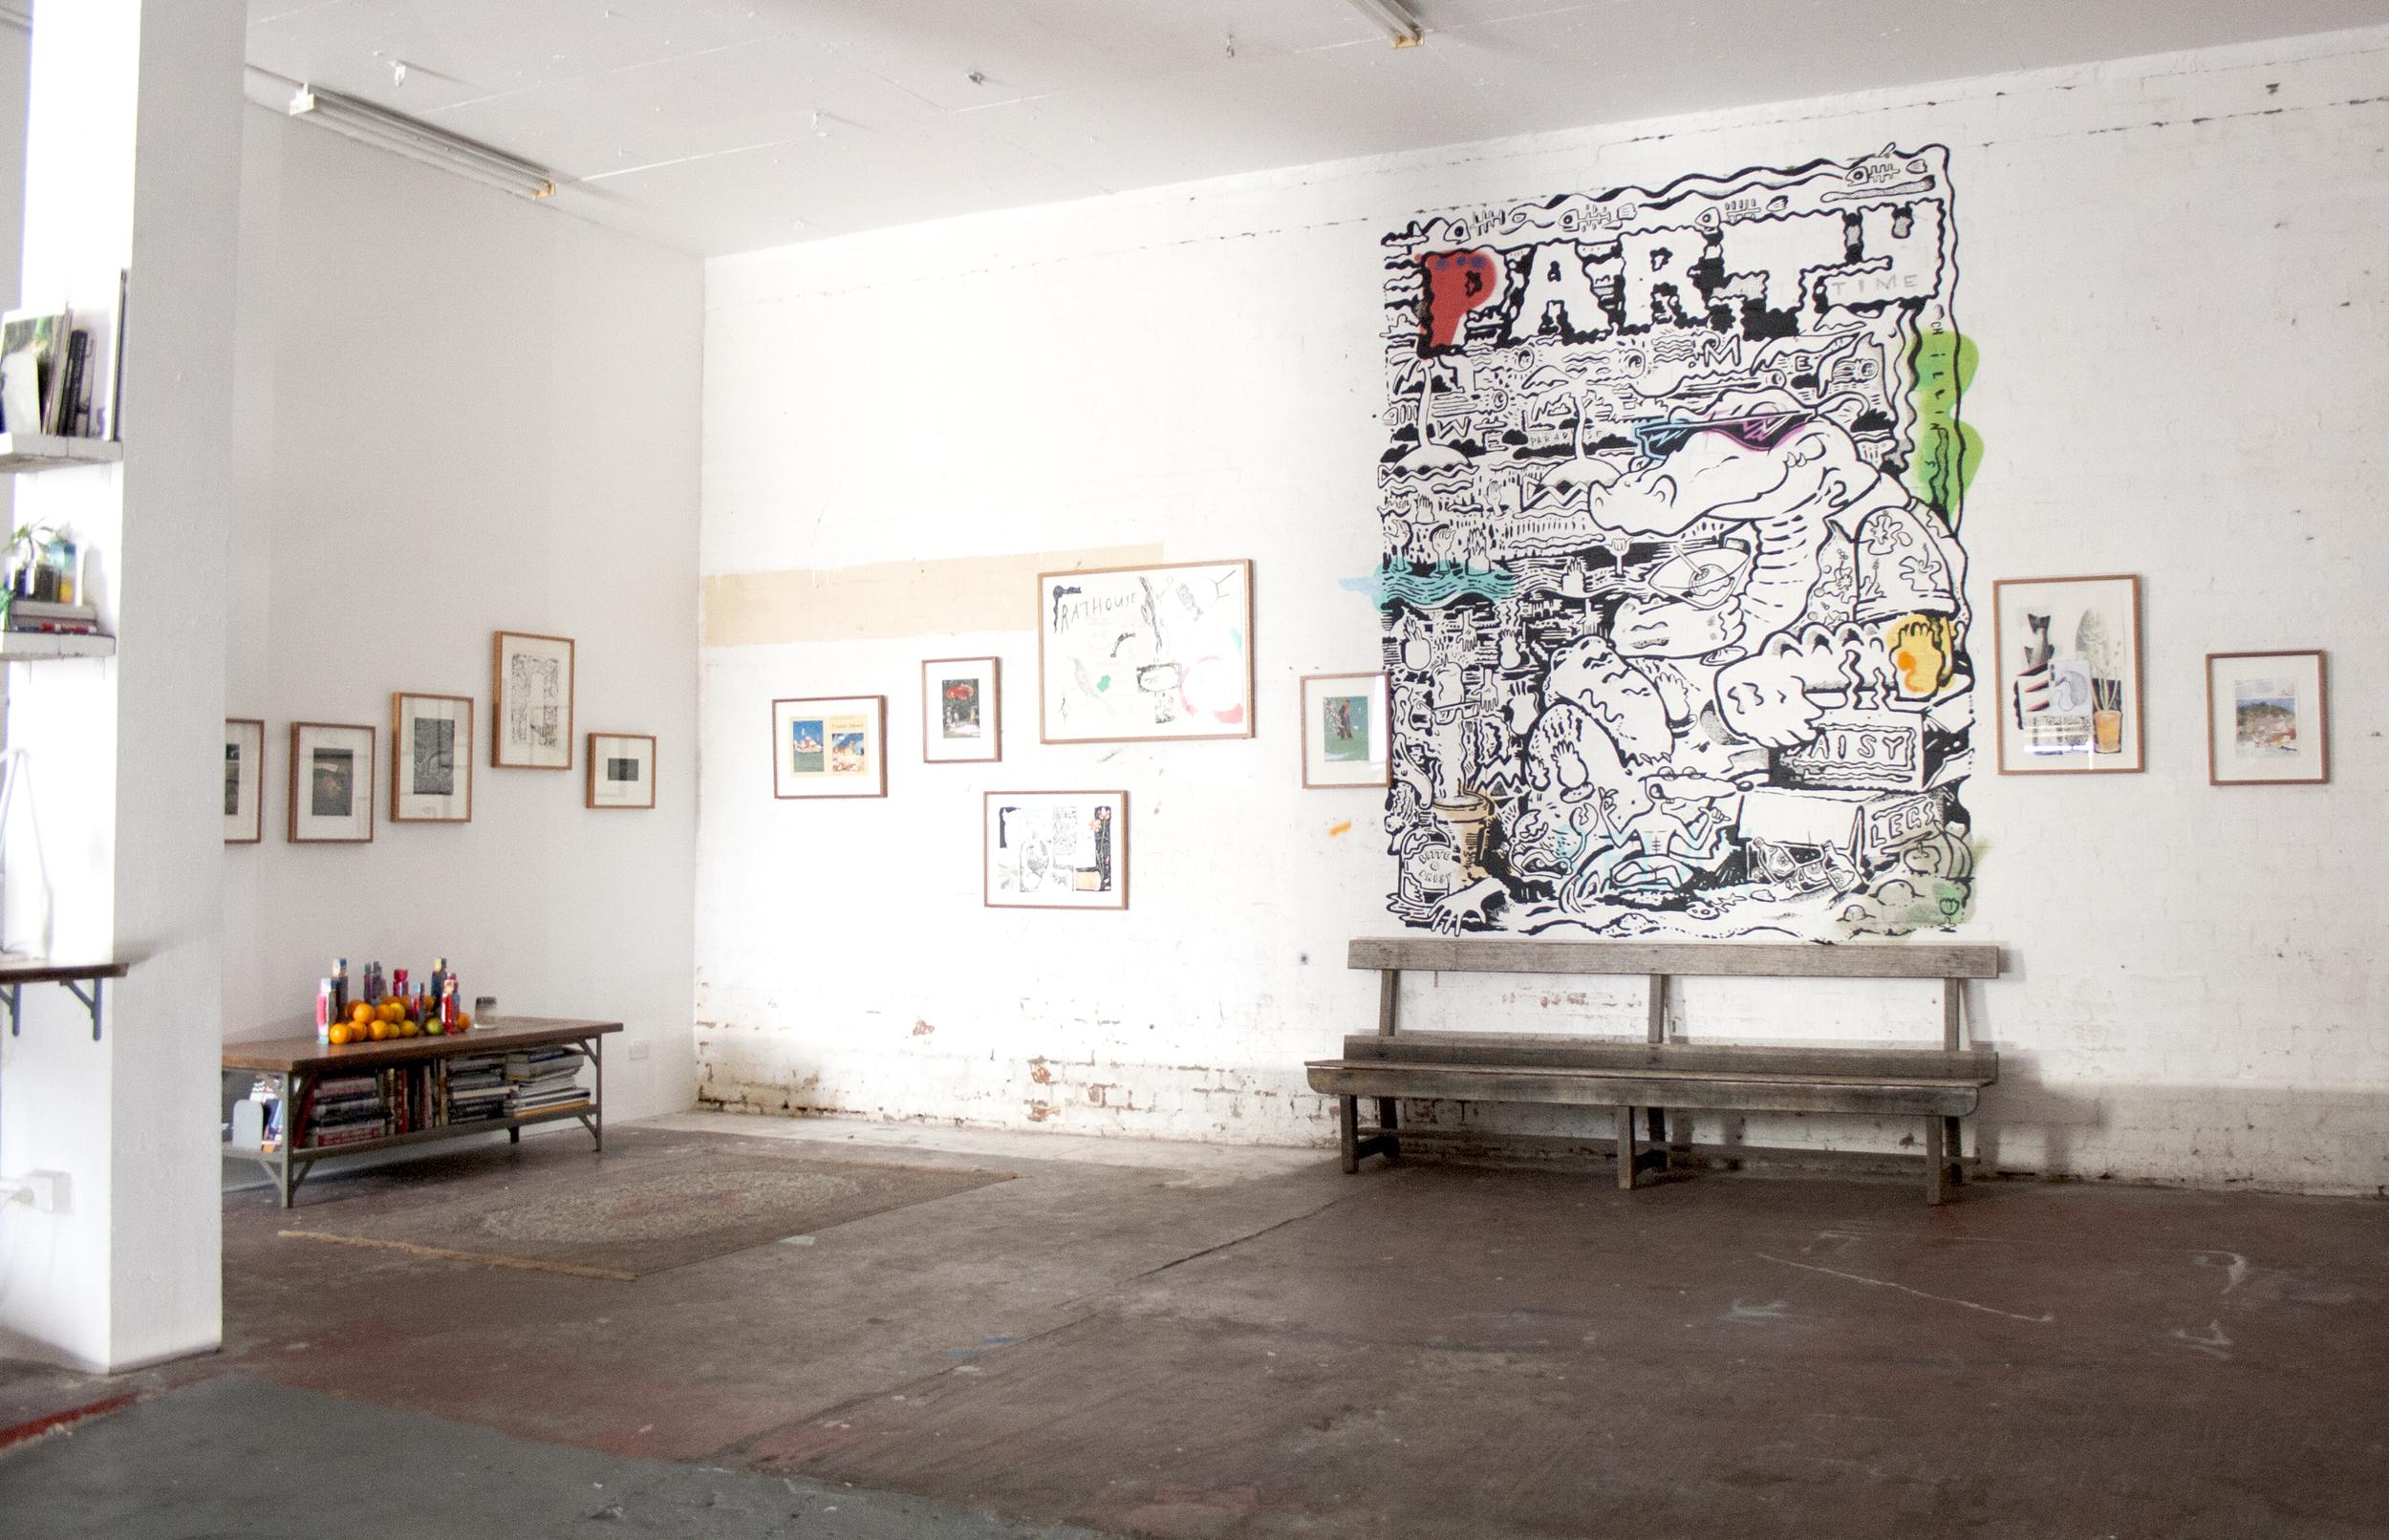 Installation view  Daisylegs Opening featuring Fraser Island (joint exhibition with Jamie Edward)   July 22nd - August 8th, 2014  Daisylegs, 9 Carlton Street, Prahran, Victoria, Australia